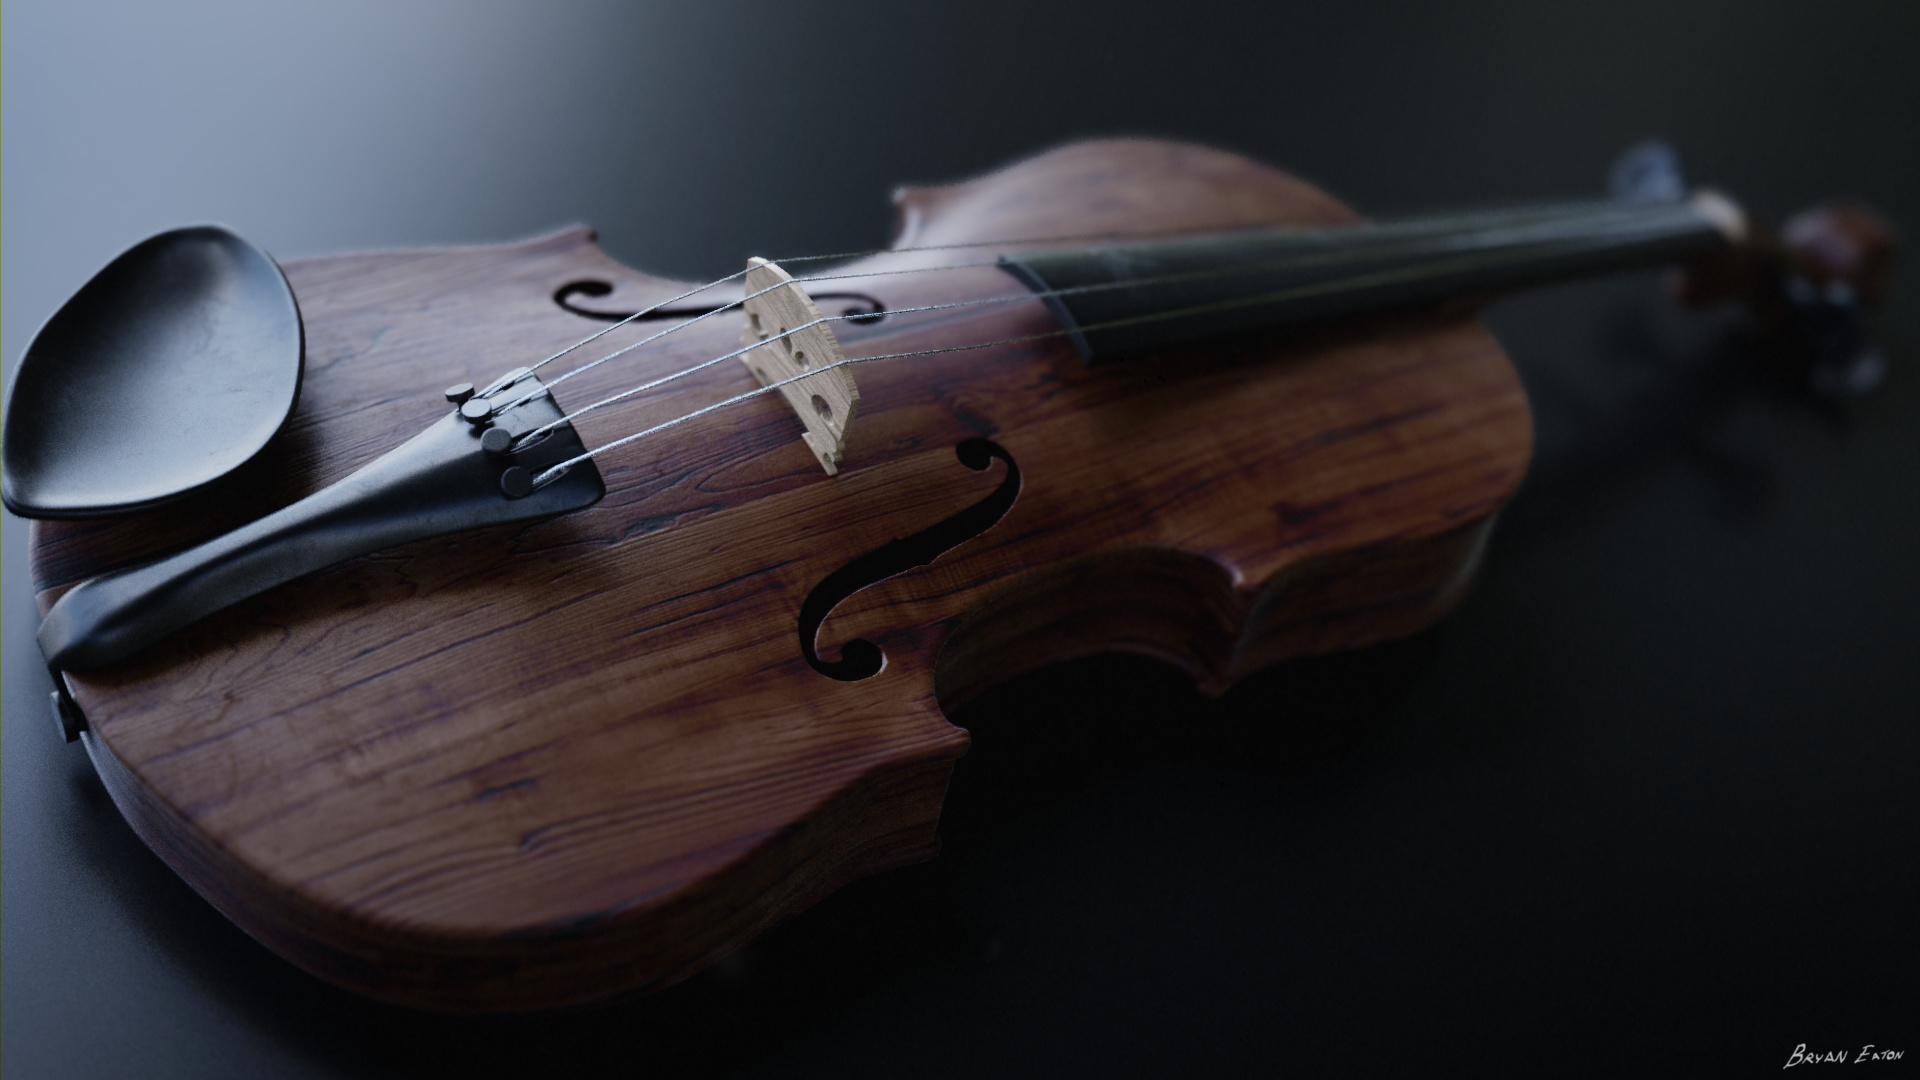 Violin - Finished Projects - Blender Artists Community